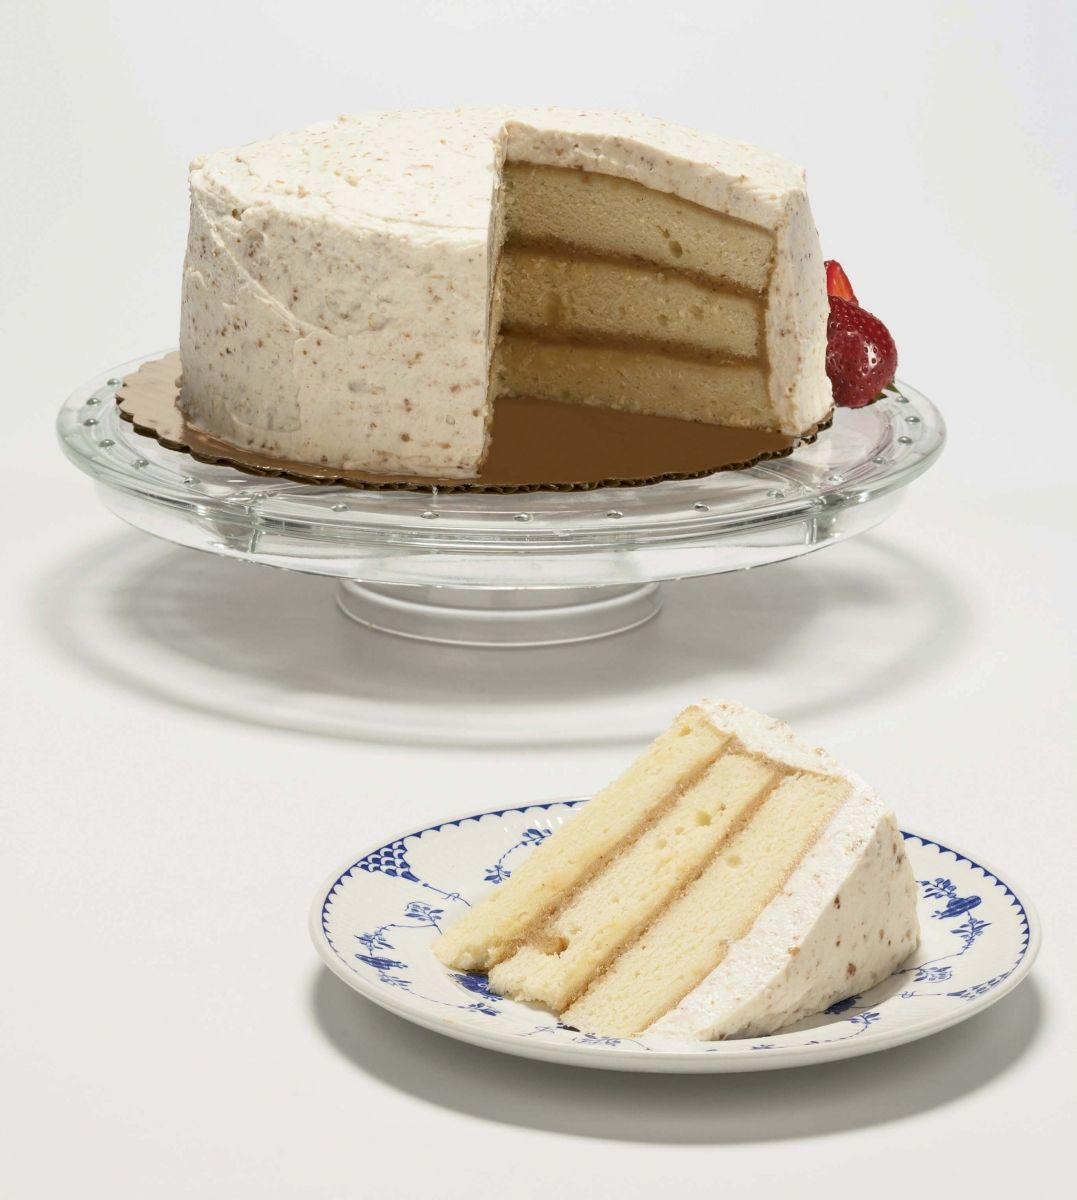 Award Winning Cake Recipes From Scratch: Katie Evatt's Carolina Cream Cake. This 2012 Top Cake